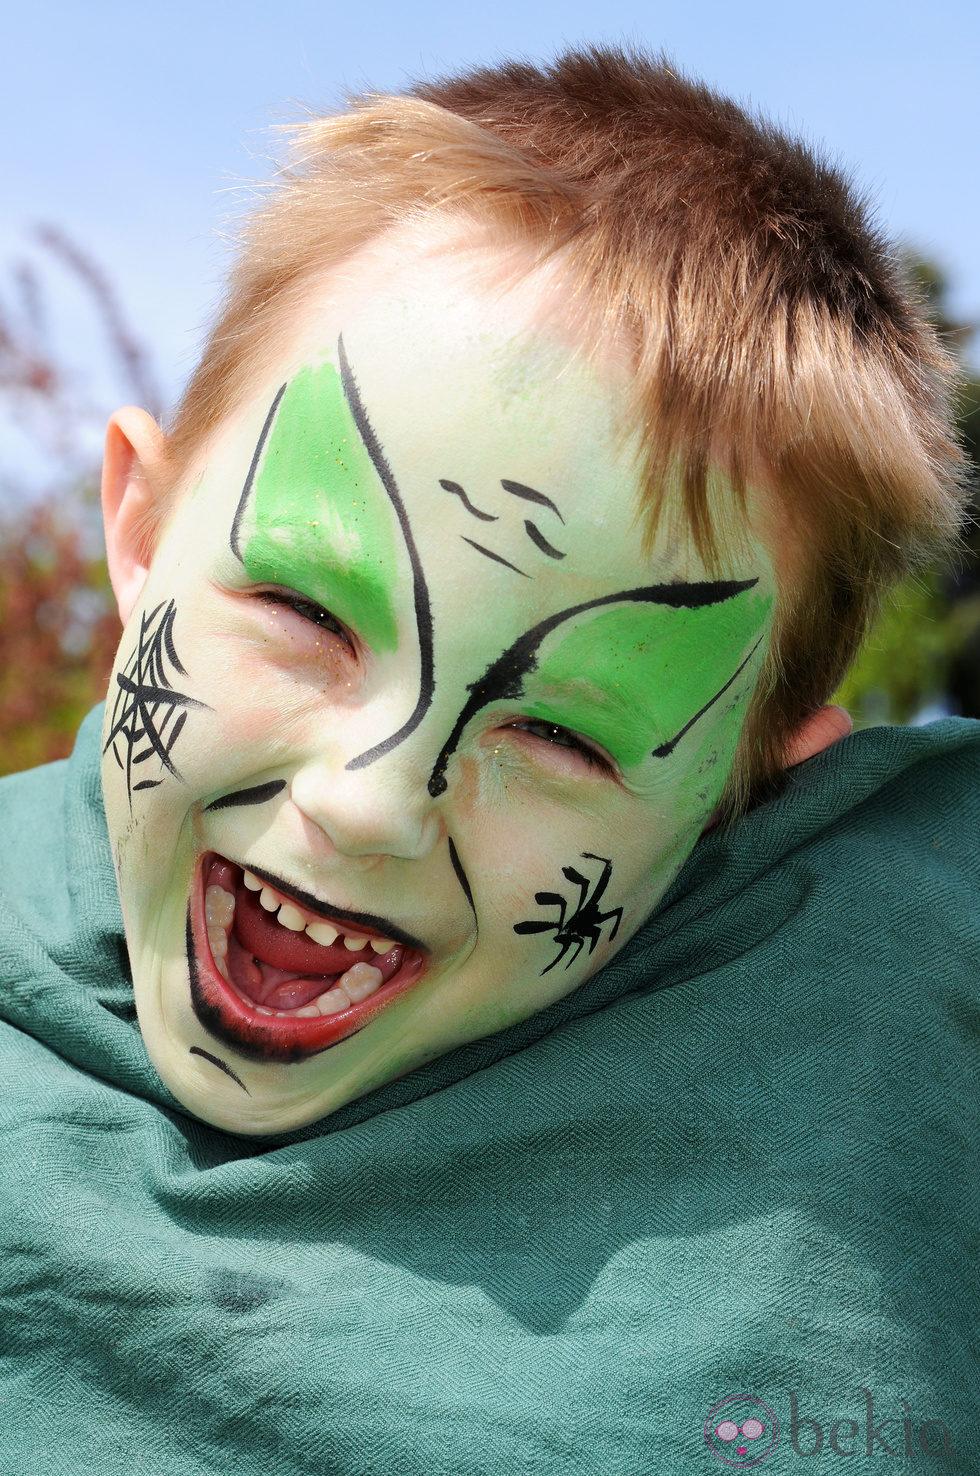 Maquillaje de duende verde de halloween maquillaje de - Traje de duende para nino ...